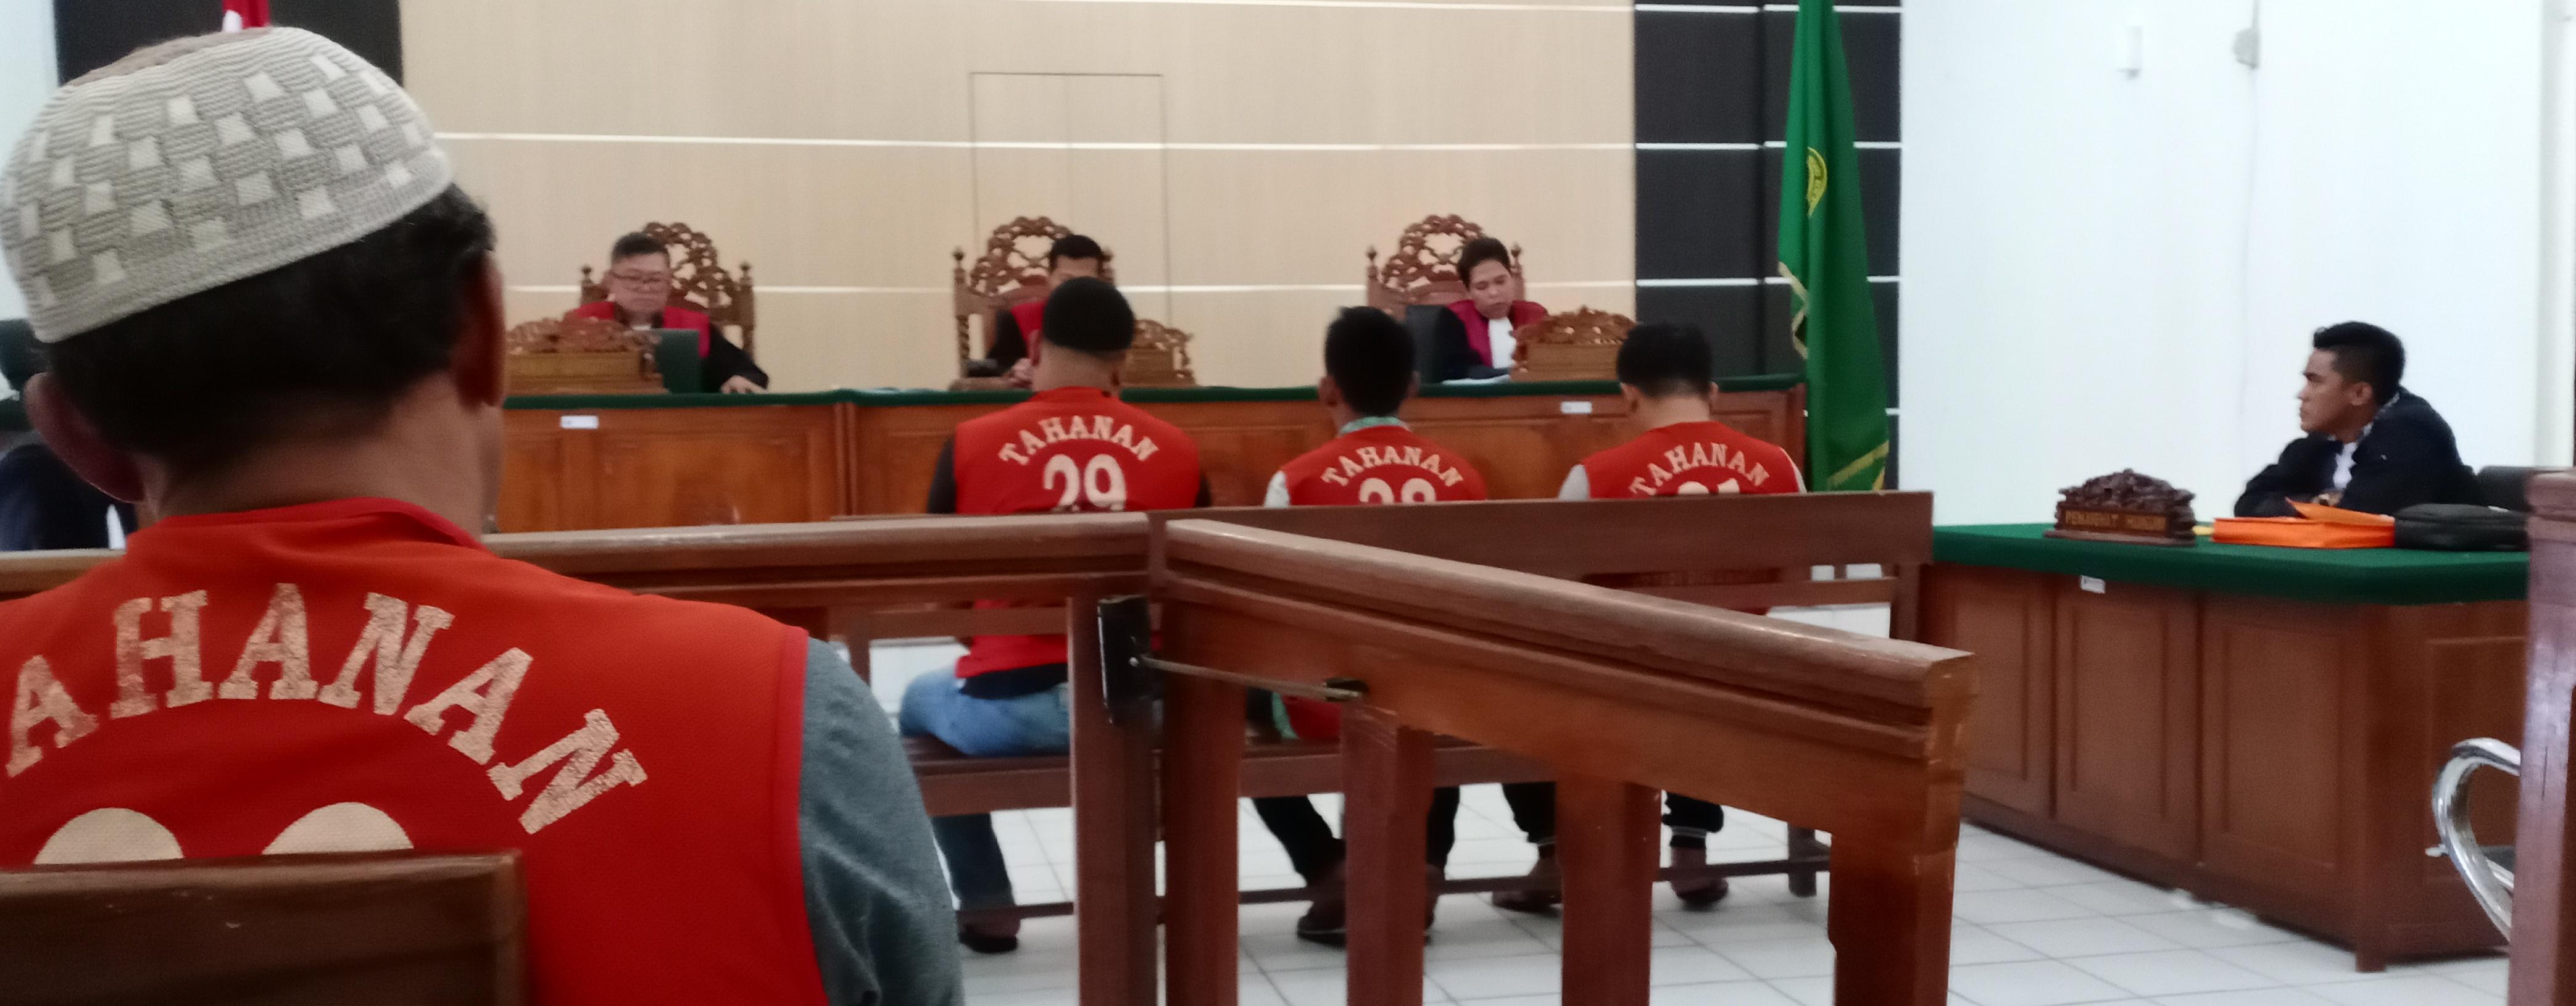 Tiga Terdakwa Narkotika di Vonis Lebih Ringan dari Tuntutan JPU